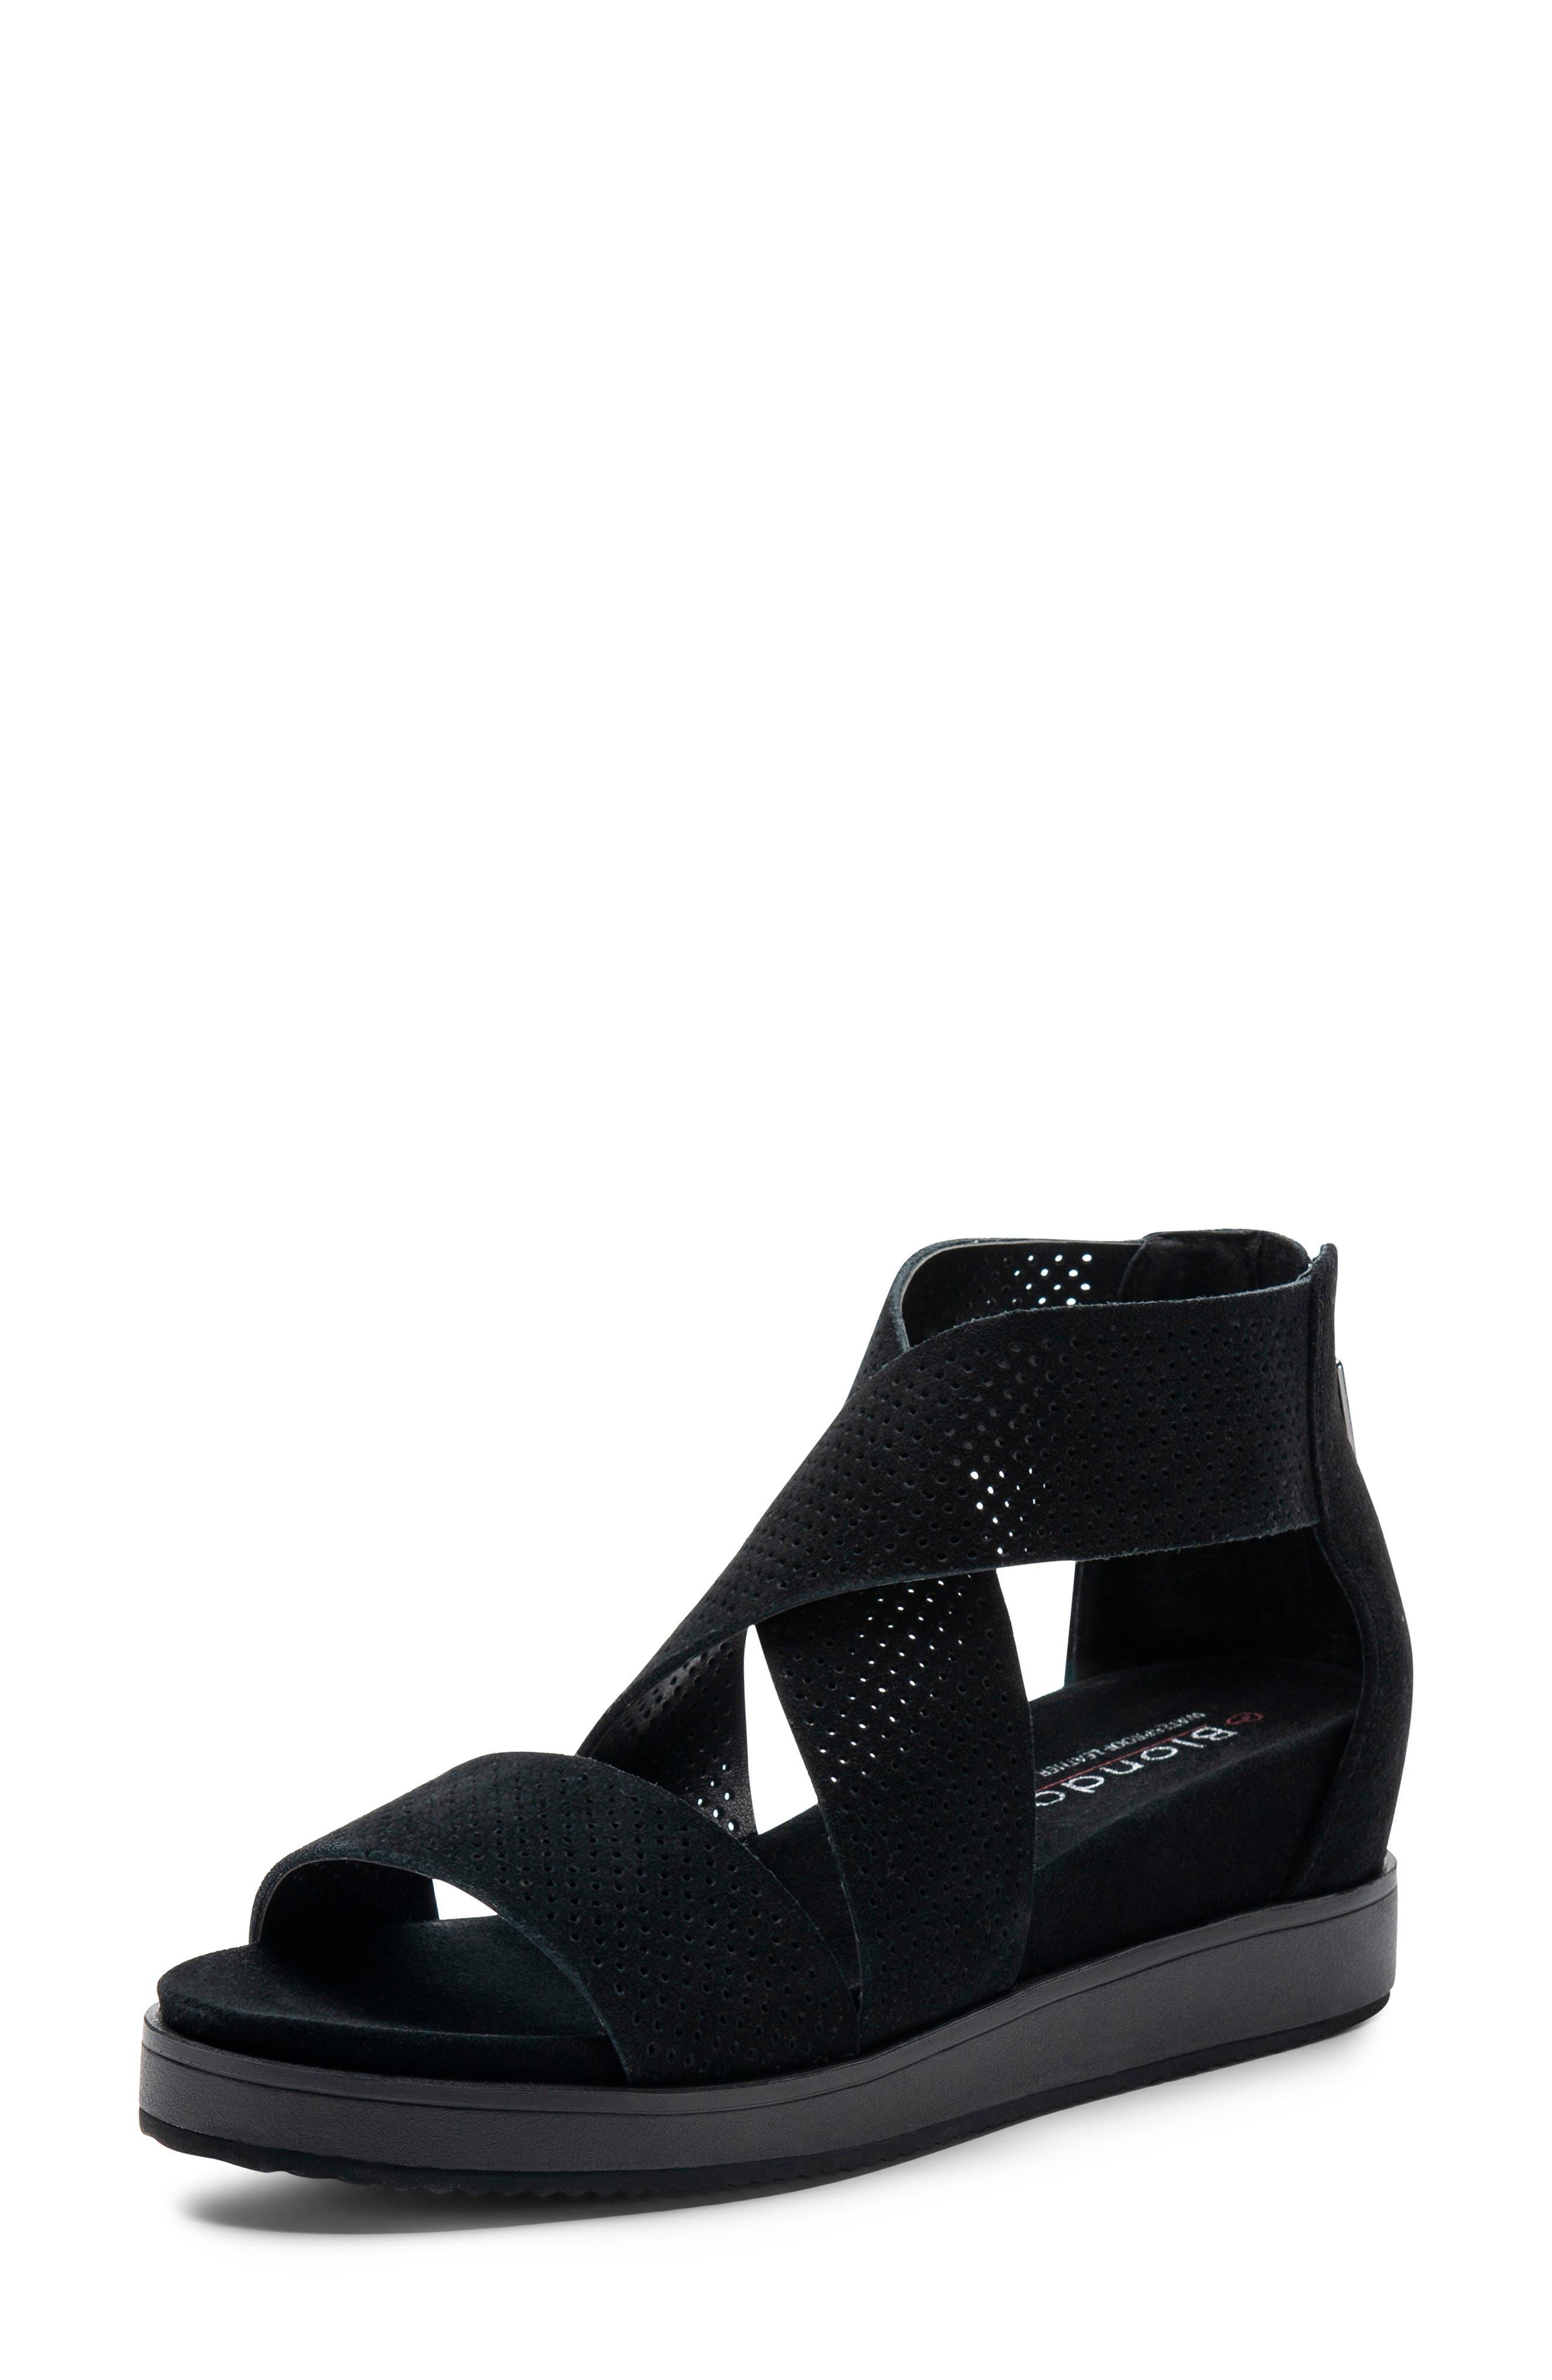 Cassie Waterproof Sandal,                             Main thumbnail 1, color,                             BLACK SUEDE